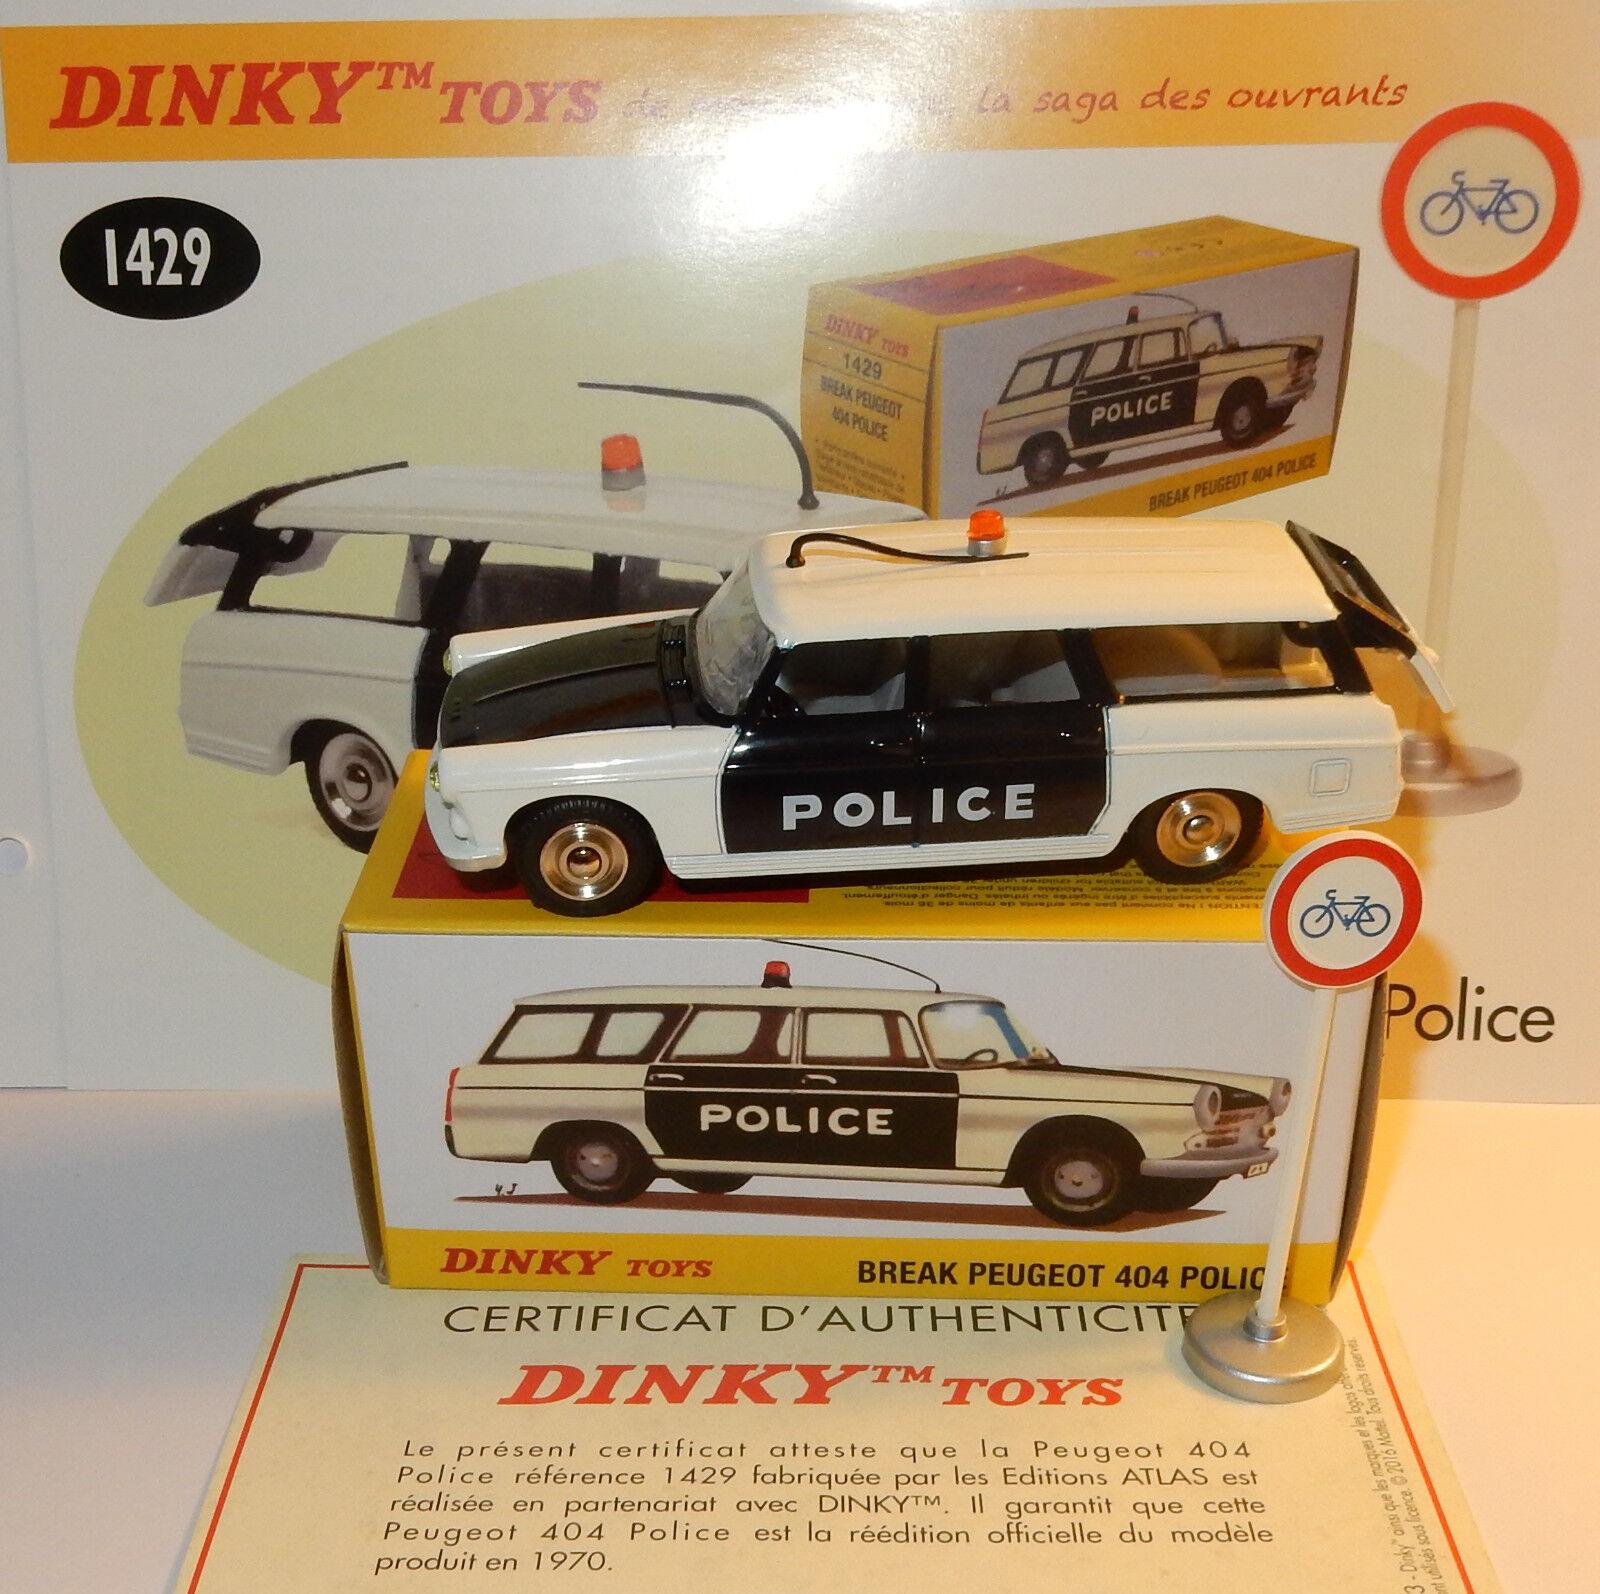 DINKY TOYS ATLAS PEUGEOT 404 POLICE PIE + PANNEAU 1 43 REF 1429 IN BOX